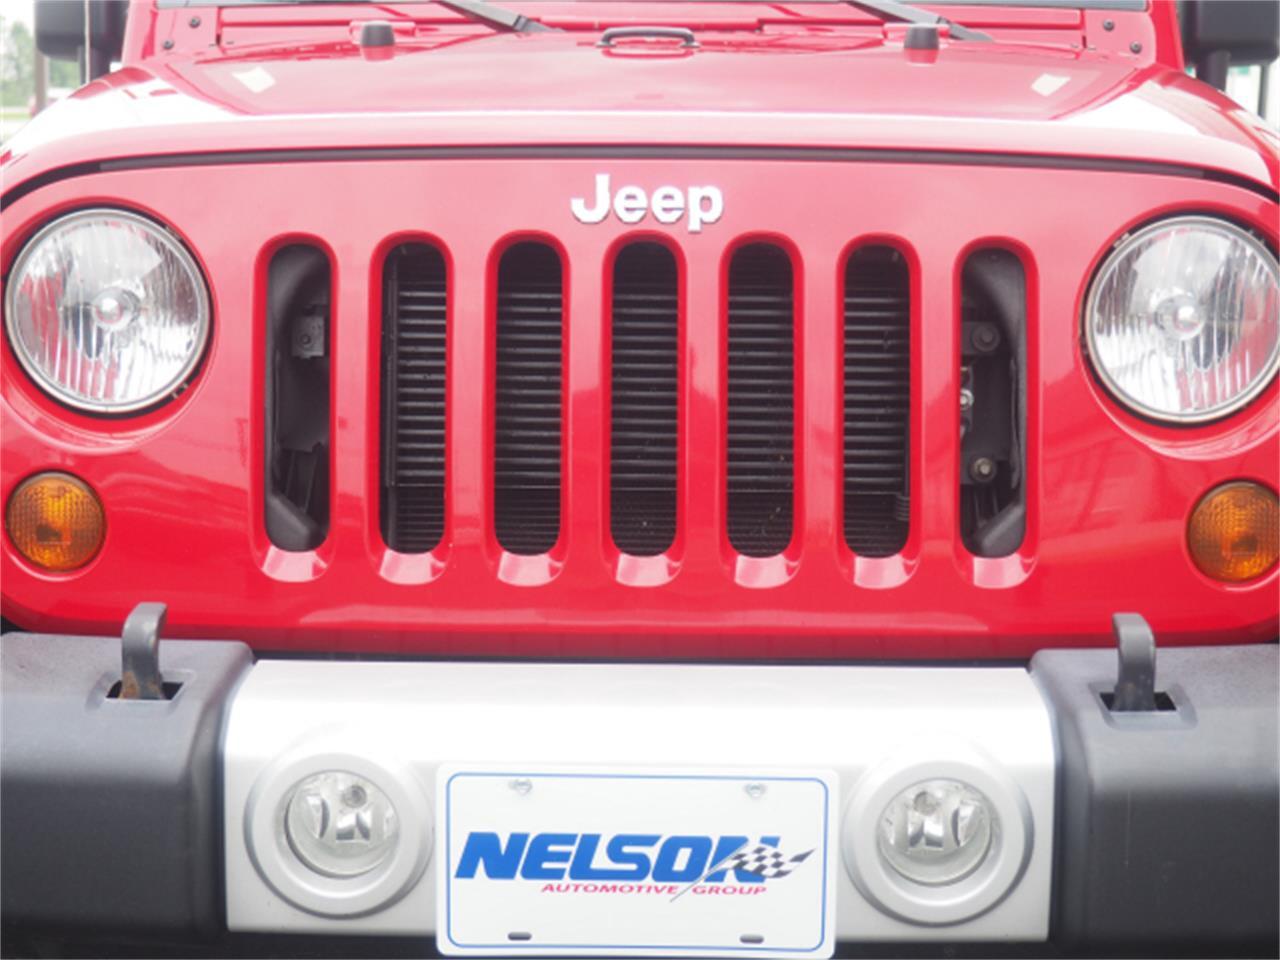 2012 Jeep Wrangler (CC-1199550) for sale in Marysville, Ohio